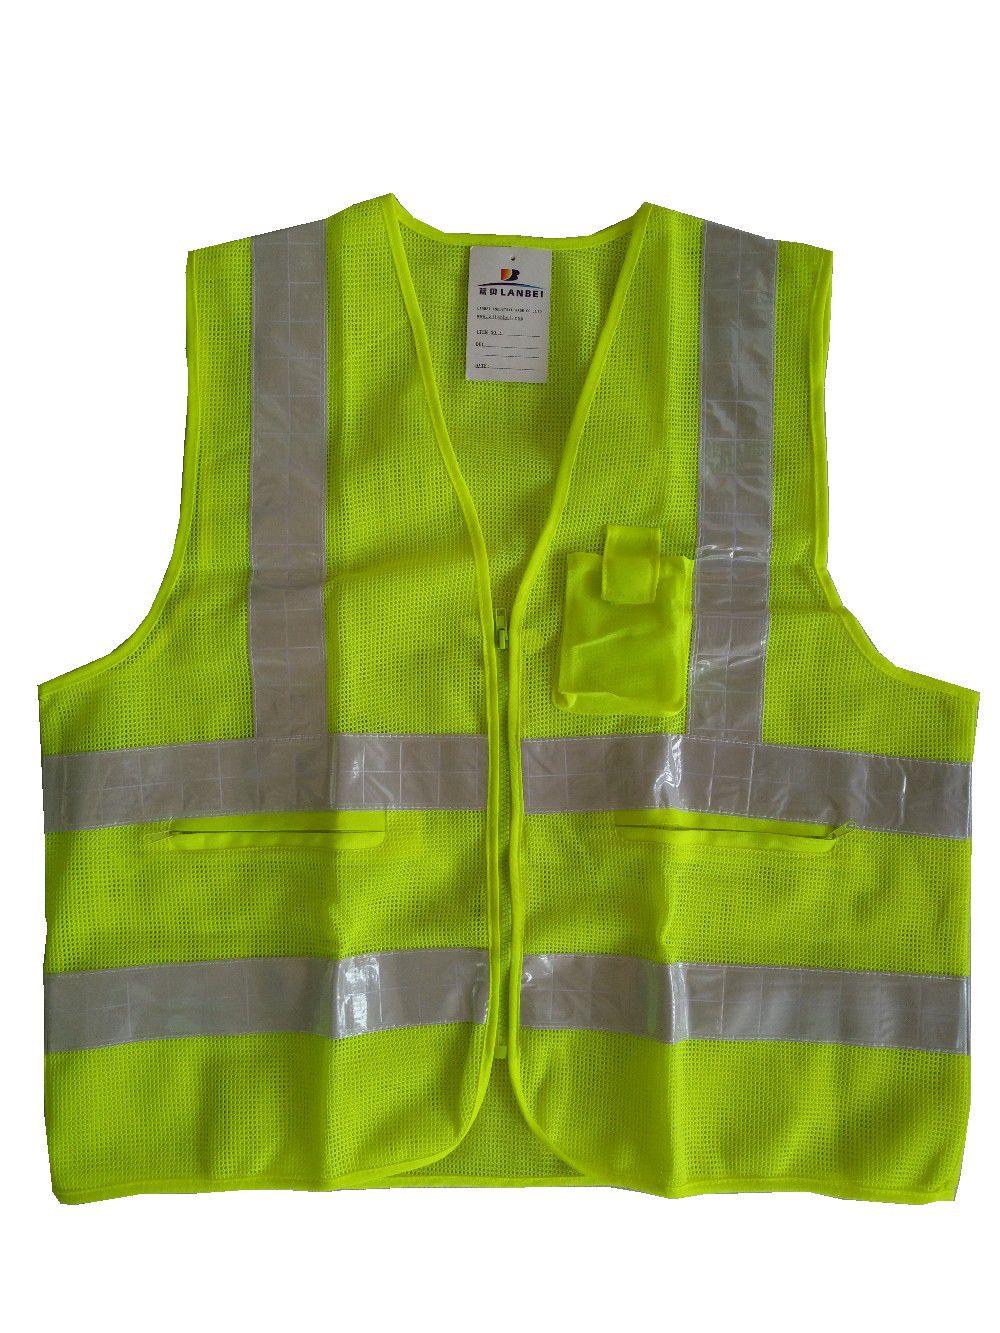 Safety Vest Yellow Mesh Vest Traffic Fluorescent light PVC Tape